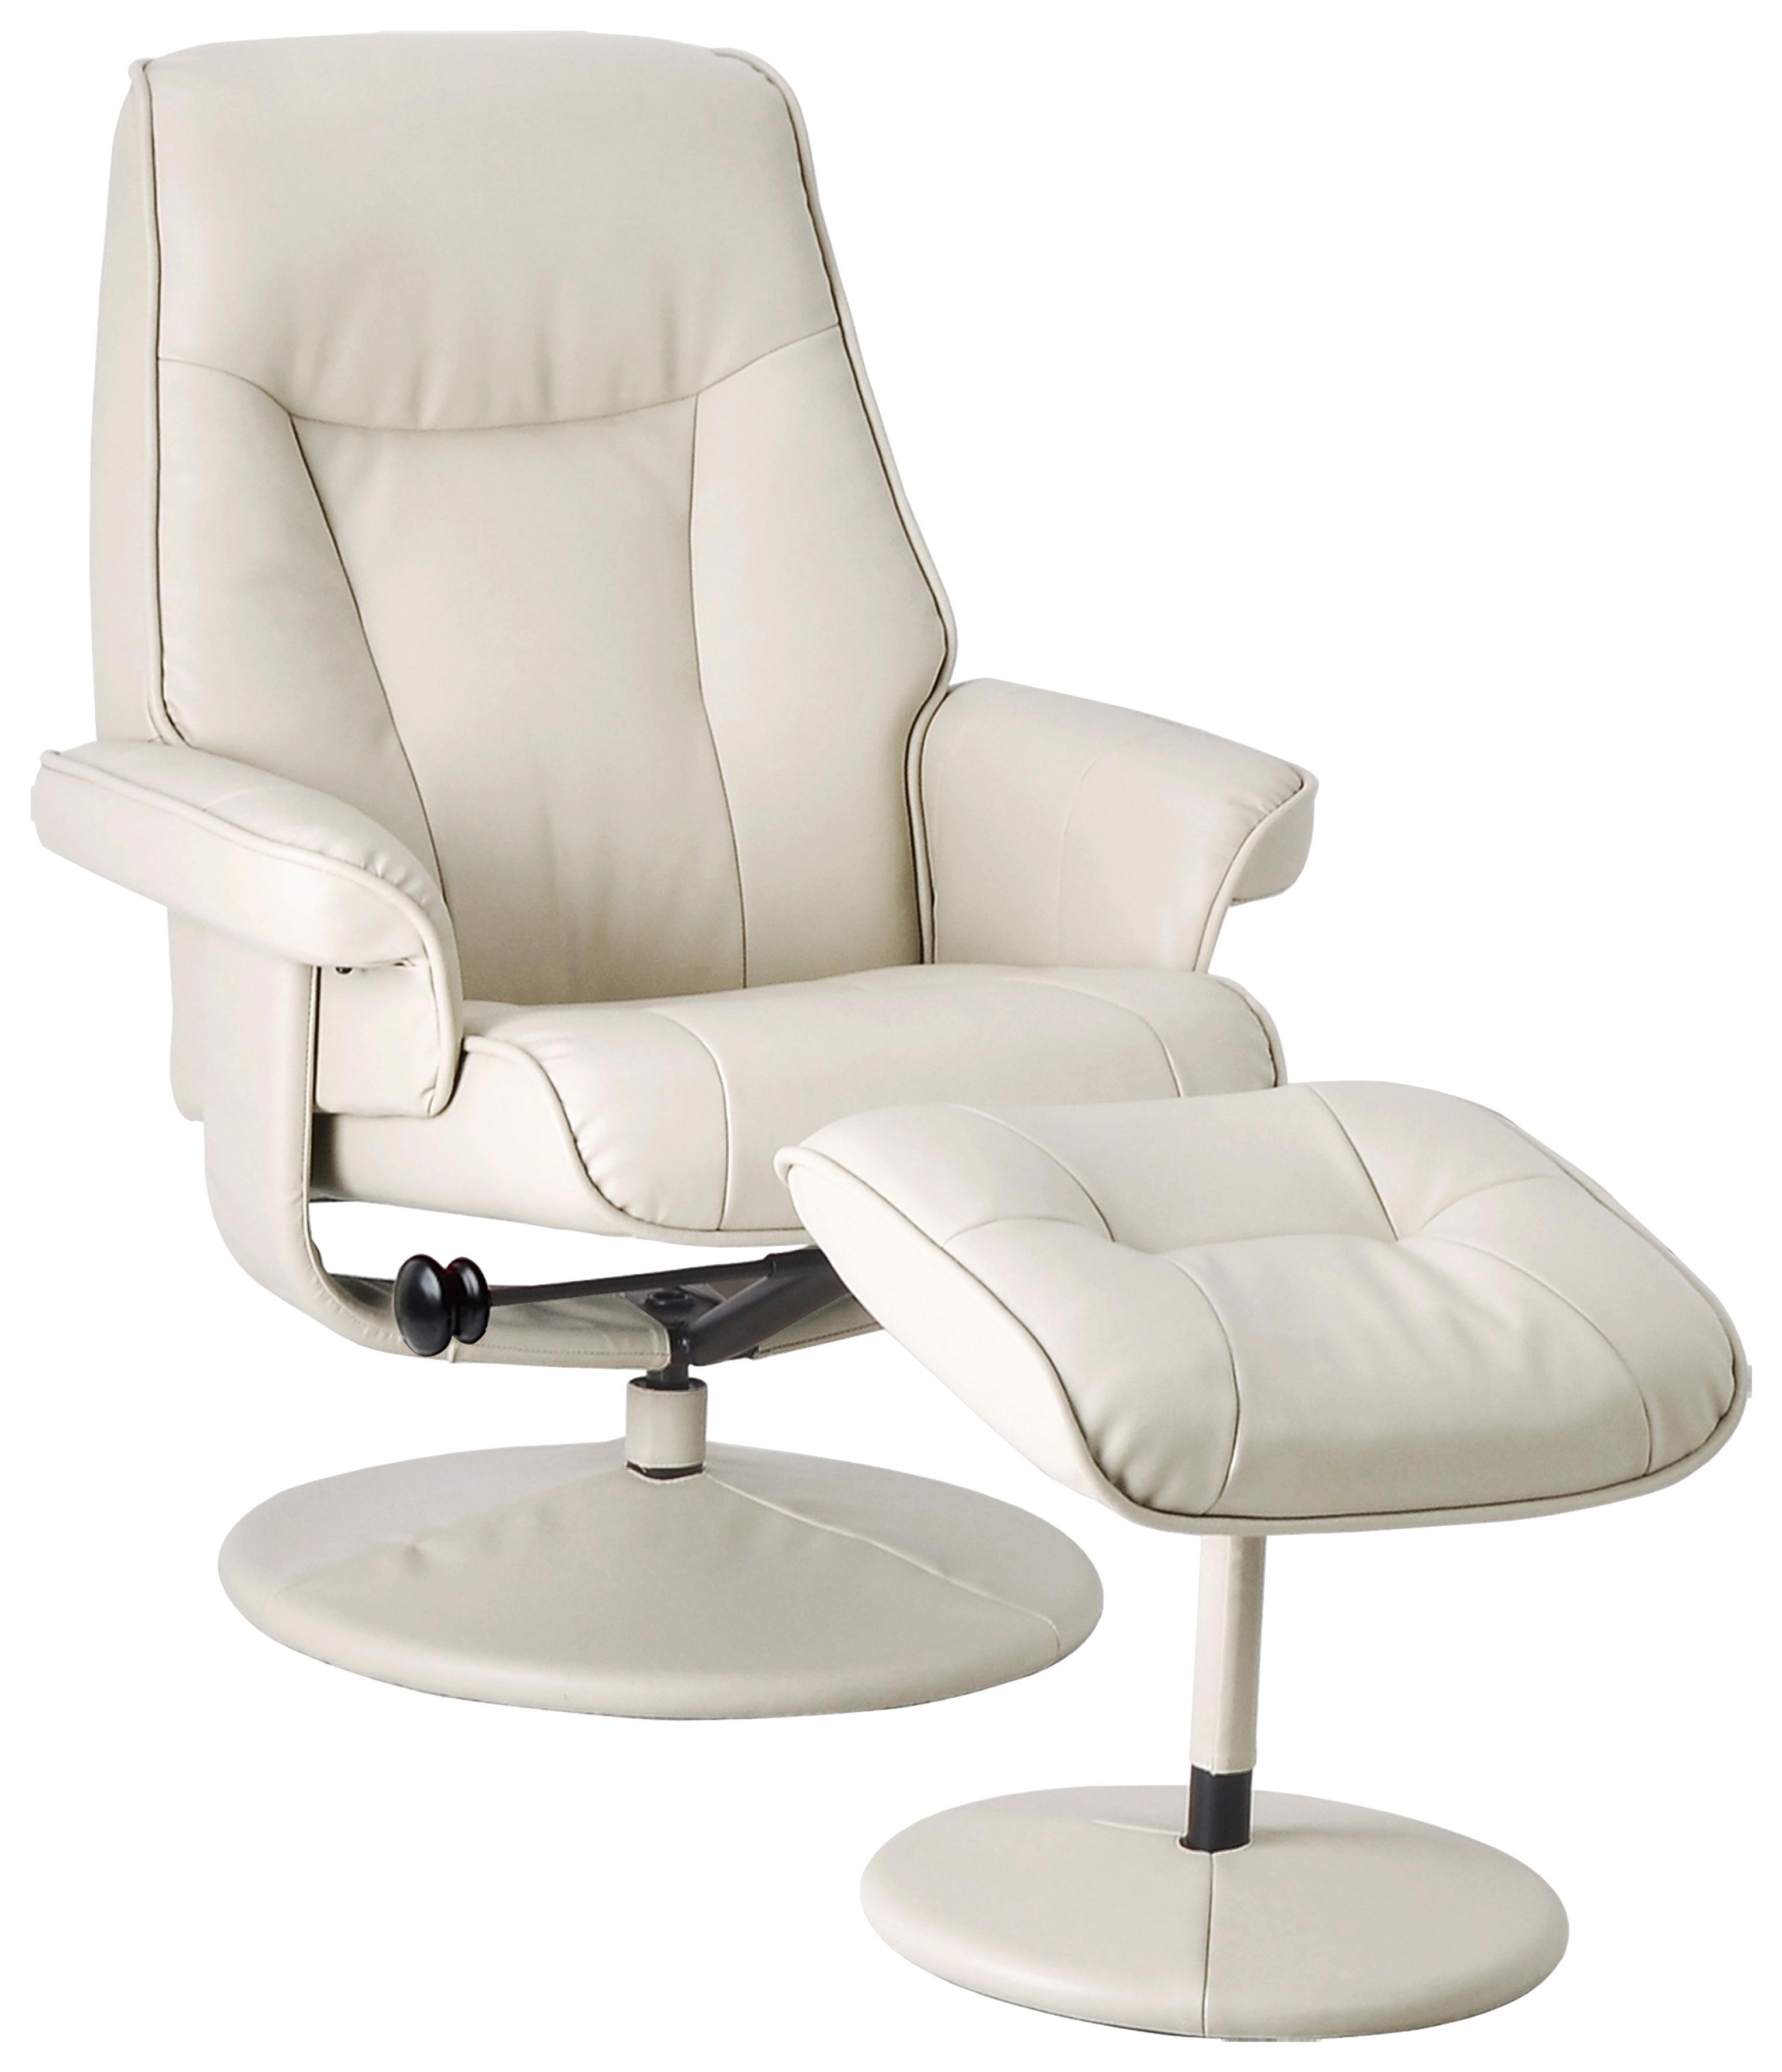 Massagesessel | Wohnzimmer > Sessel > Massagesessel | Beige | Kunstleder